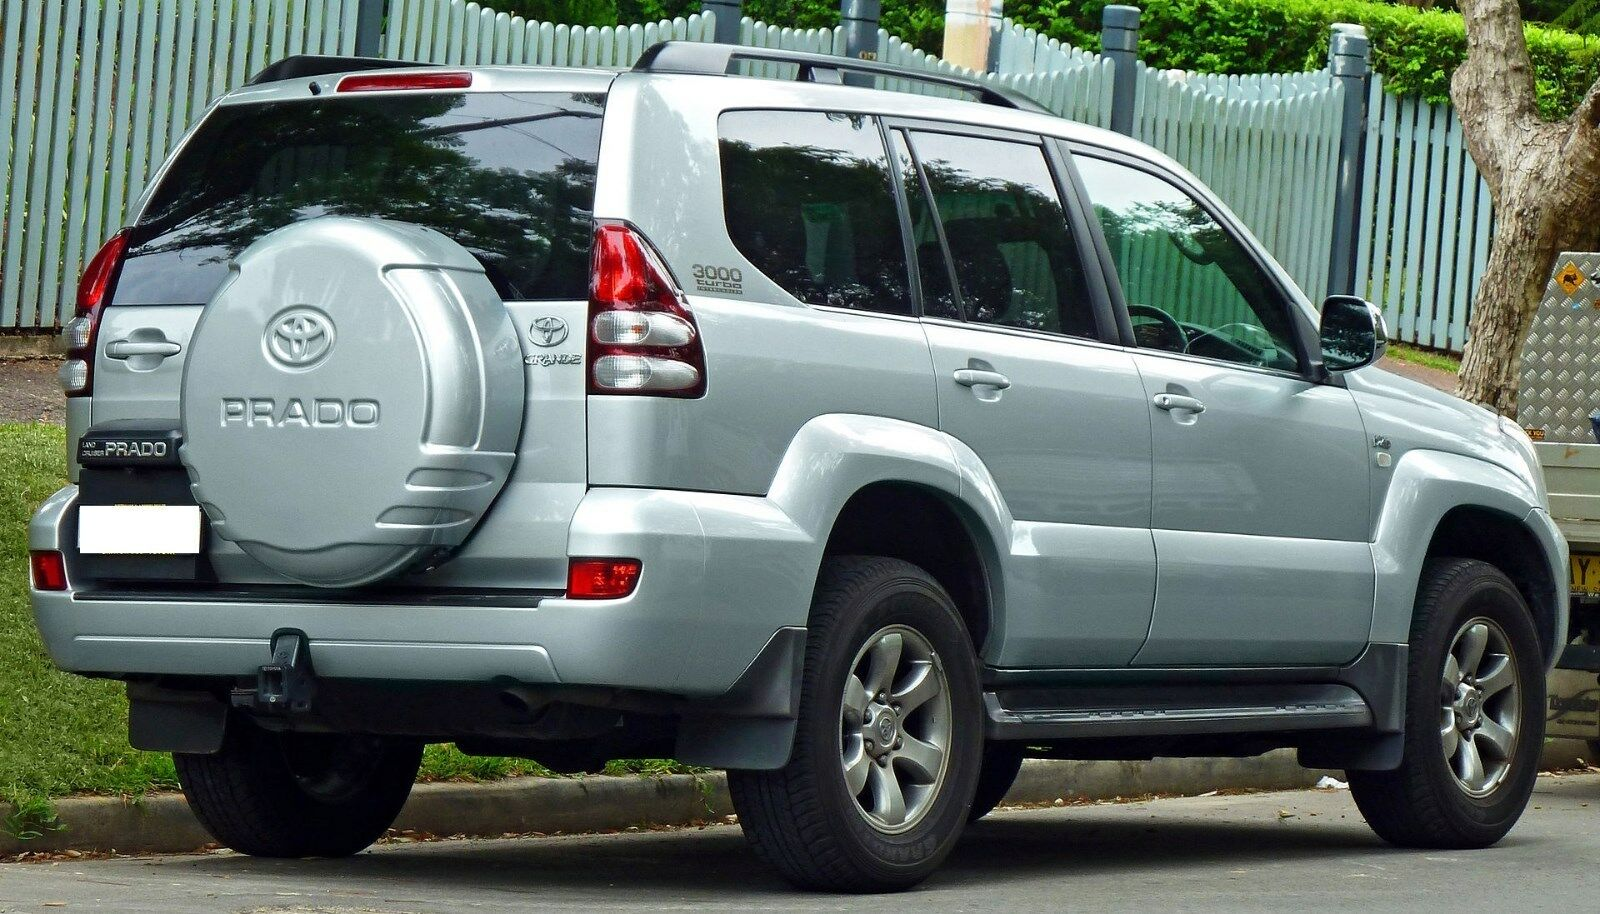 Toyota Landcruiser Prado 120 125 Series 2002 2009 Manual On Cd Ebay Land Cruiser Haynes Repair Norton Secured Powered By Verisign